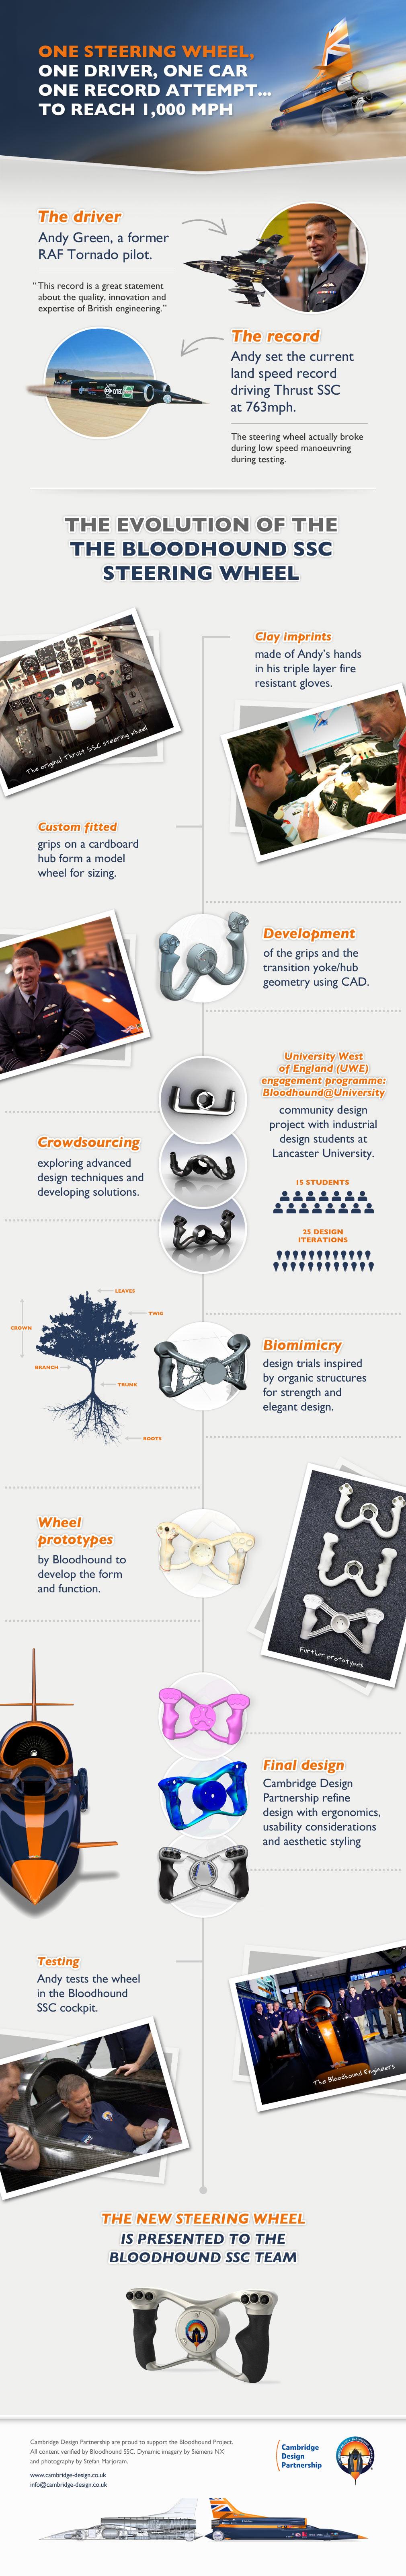 Bloodhound Steering Wheel-Infographic